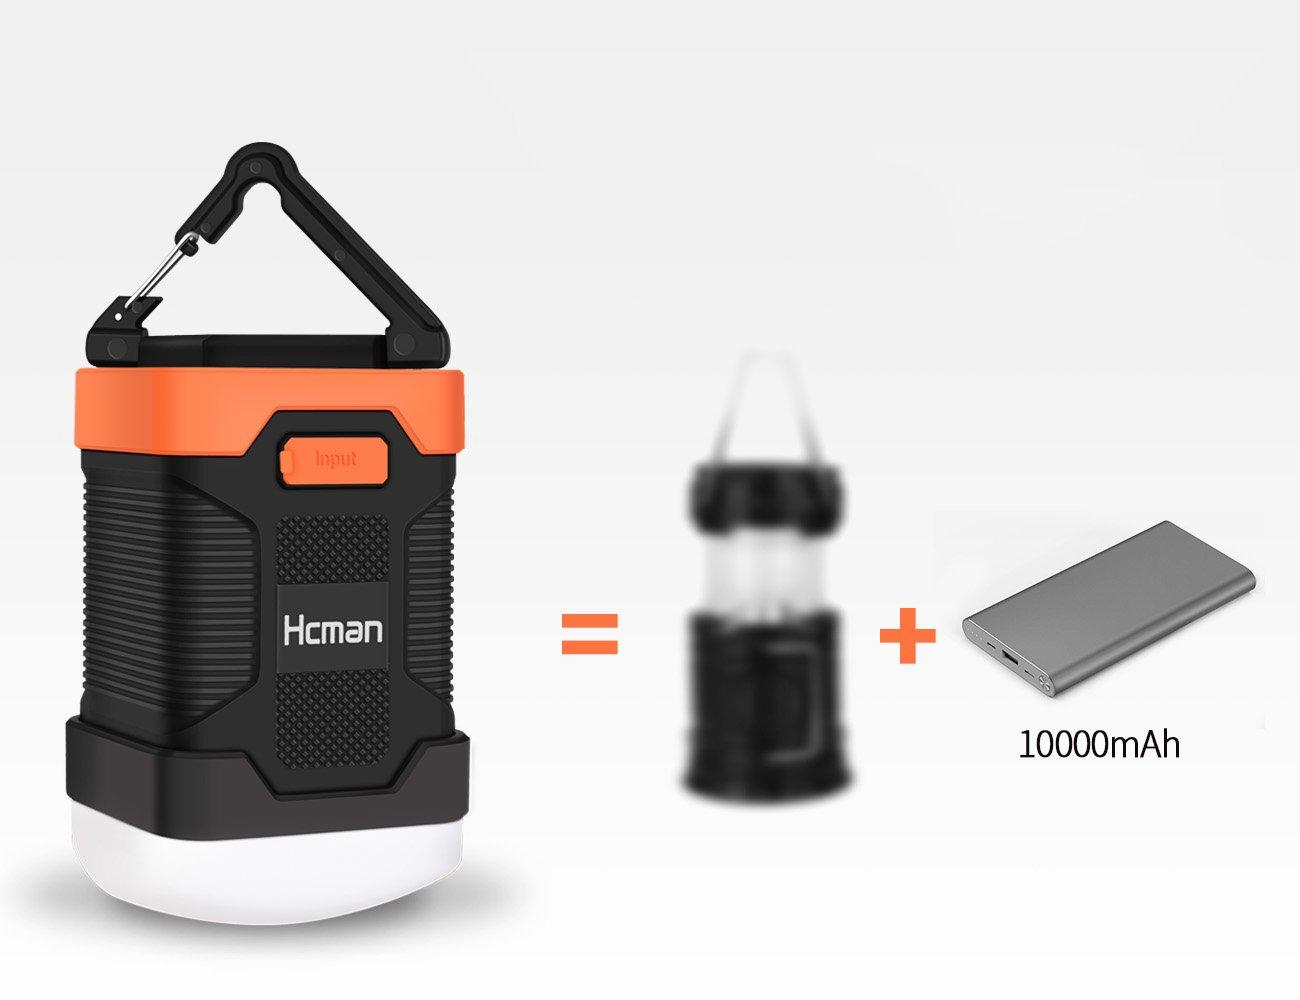 LED Camping Lantern Rechargeable Light - Hcman Power Bank 10000 mAh, Tent Flashlight Led Camping Lamp IP65 Waterproof Camping Gear Equipment for Camping, Hiking, Fishing and Emergencies